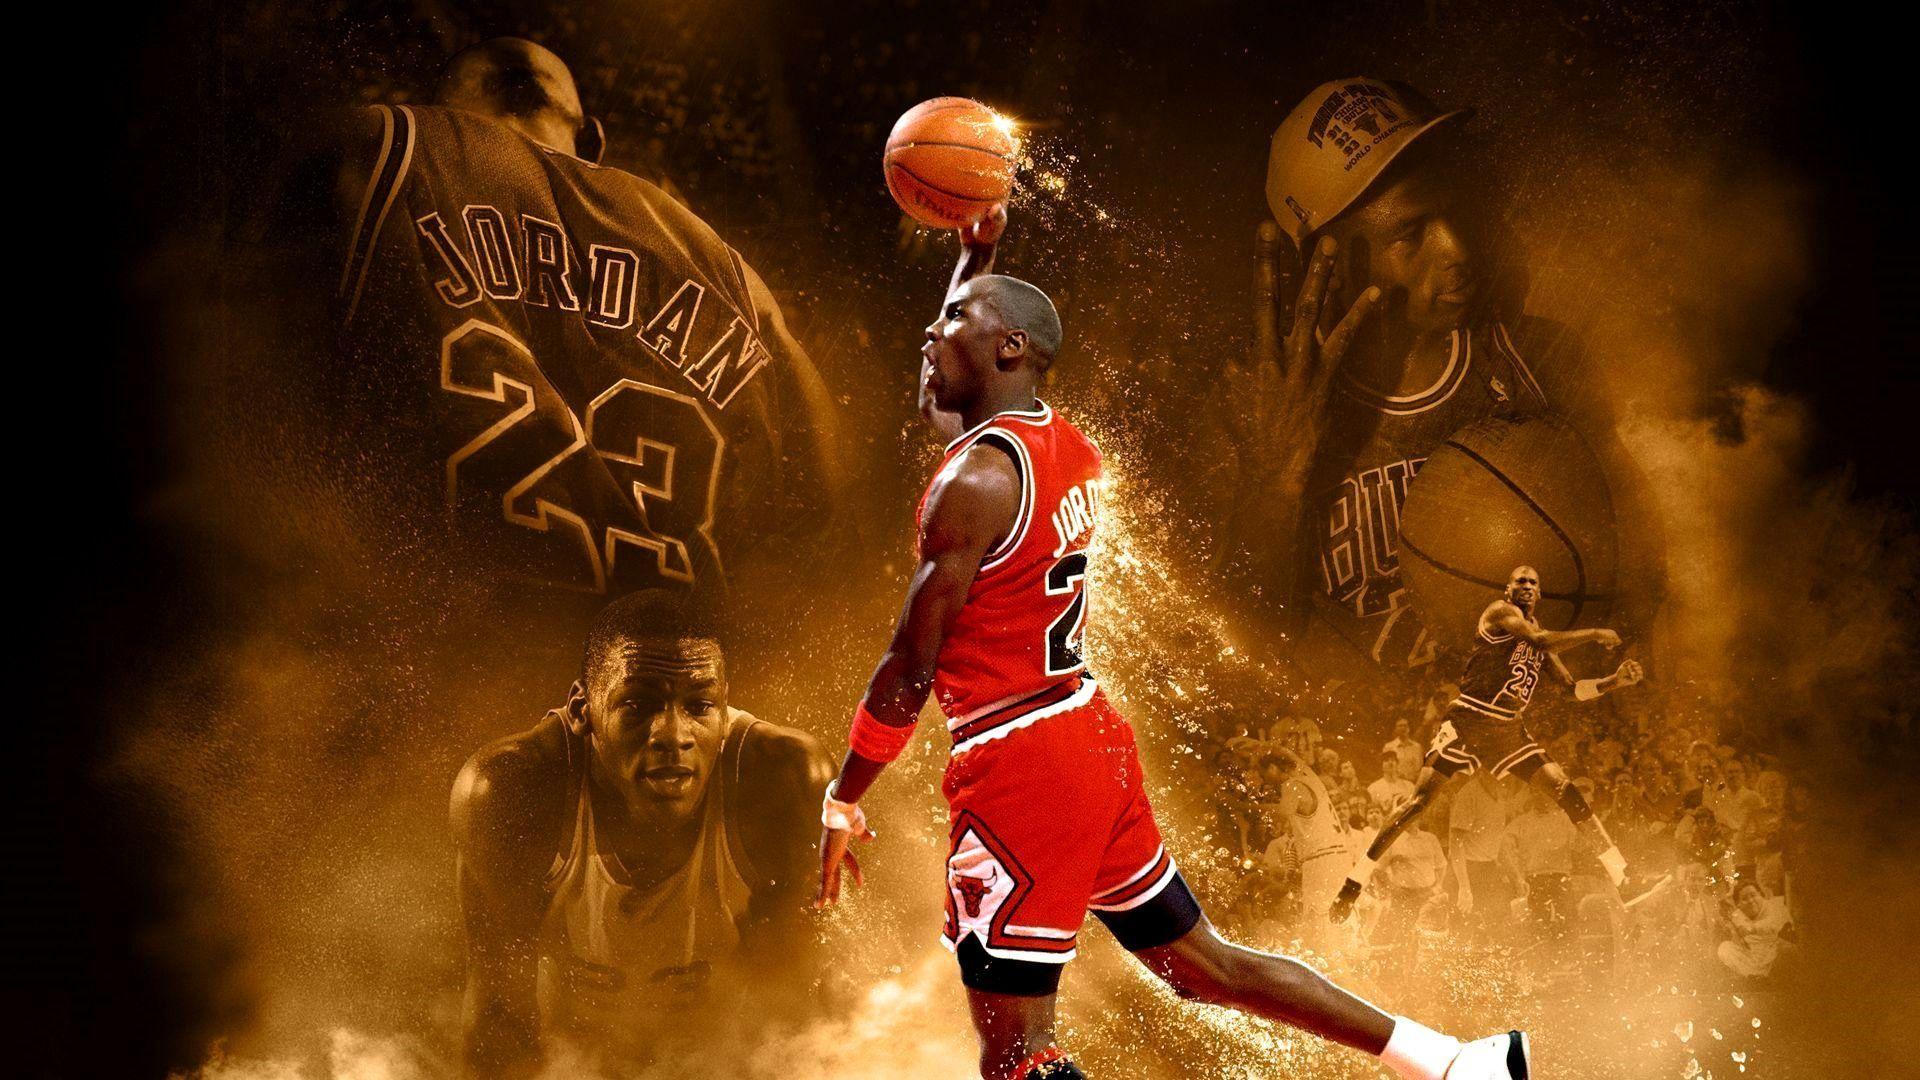 Nba Wallpaper 4K Pc Ideas 4K Nba wallpapers Basketball players 1920x1080